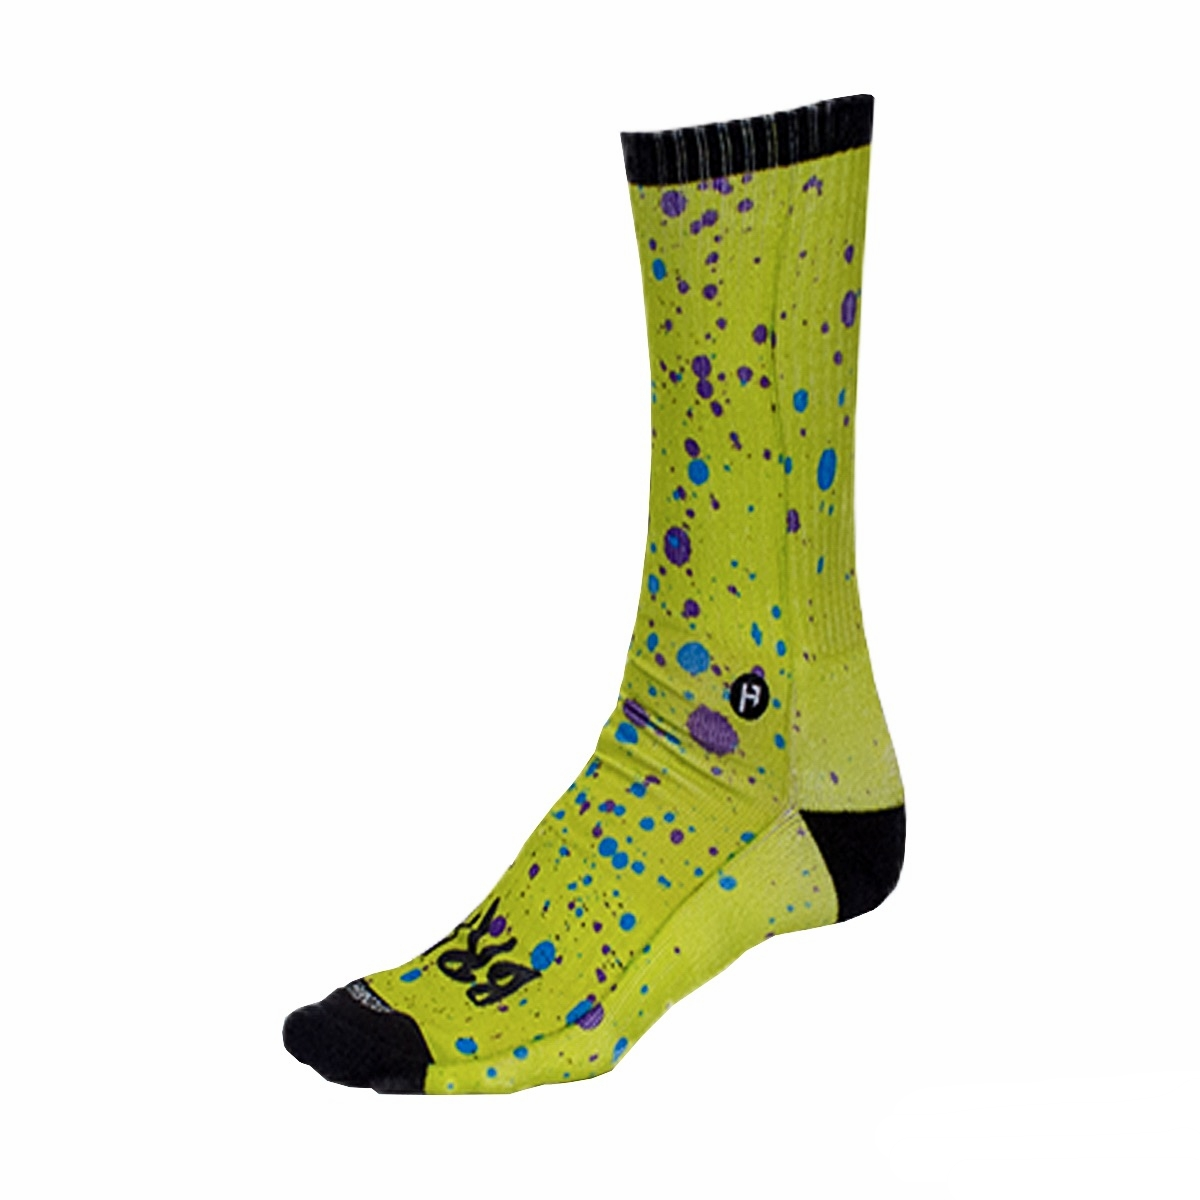 Foot Down Socks - The Splatter  ON SALE - $5